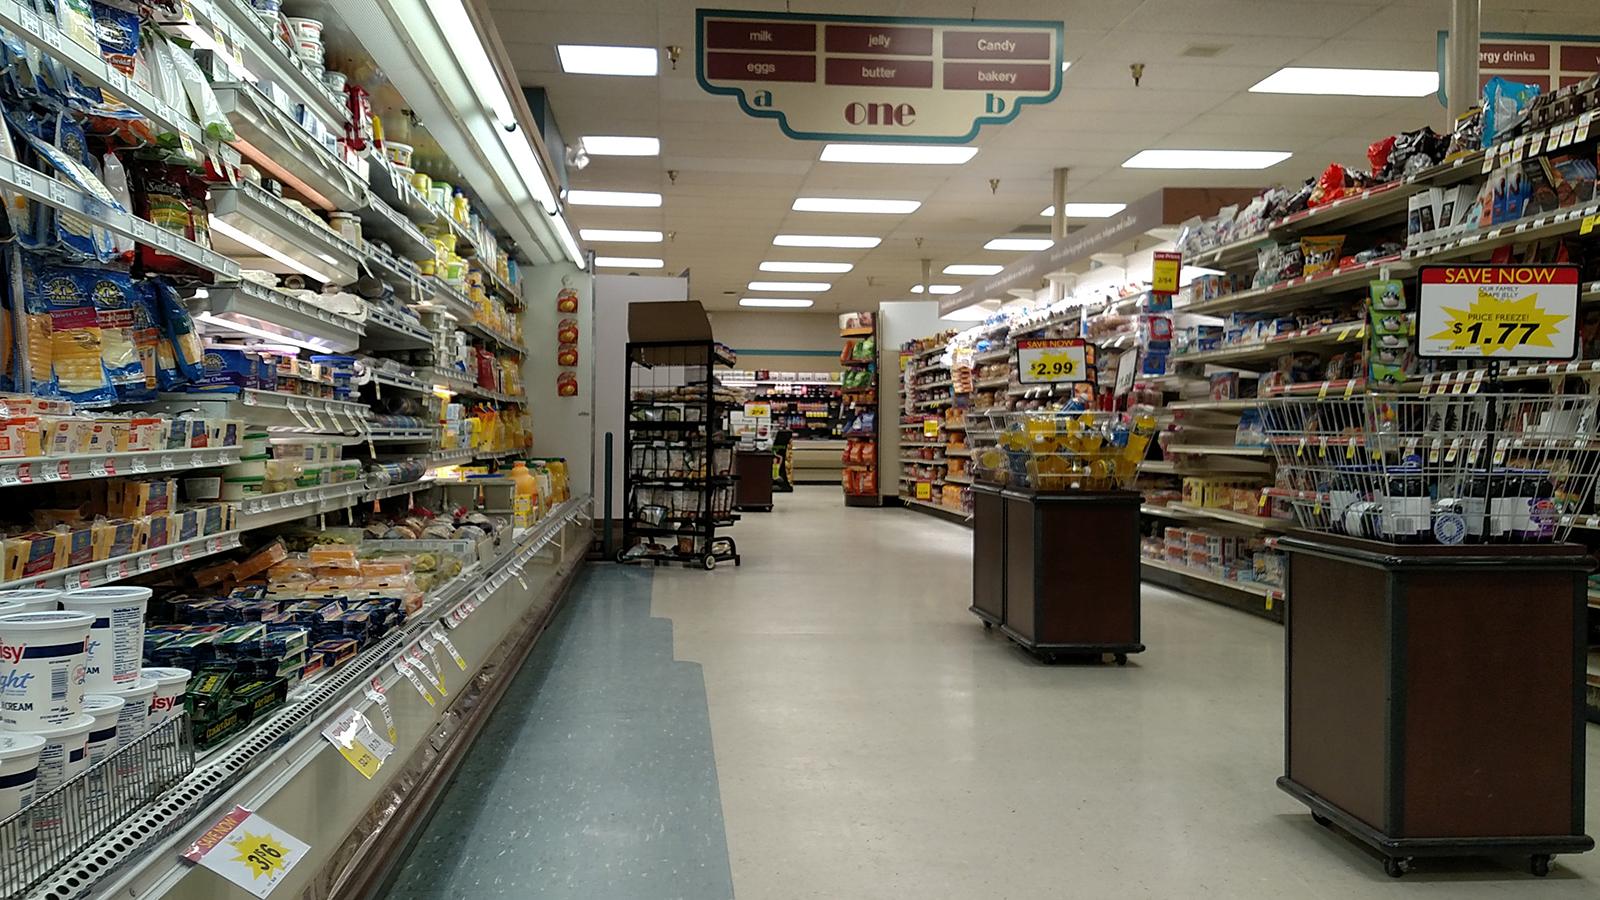 Arrowhead Dan's Supermarket interior in 2018